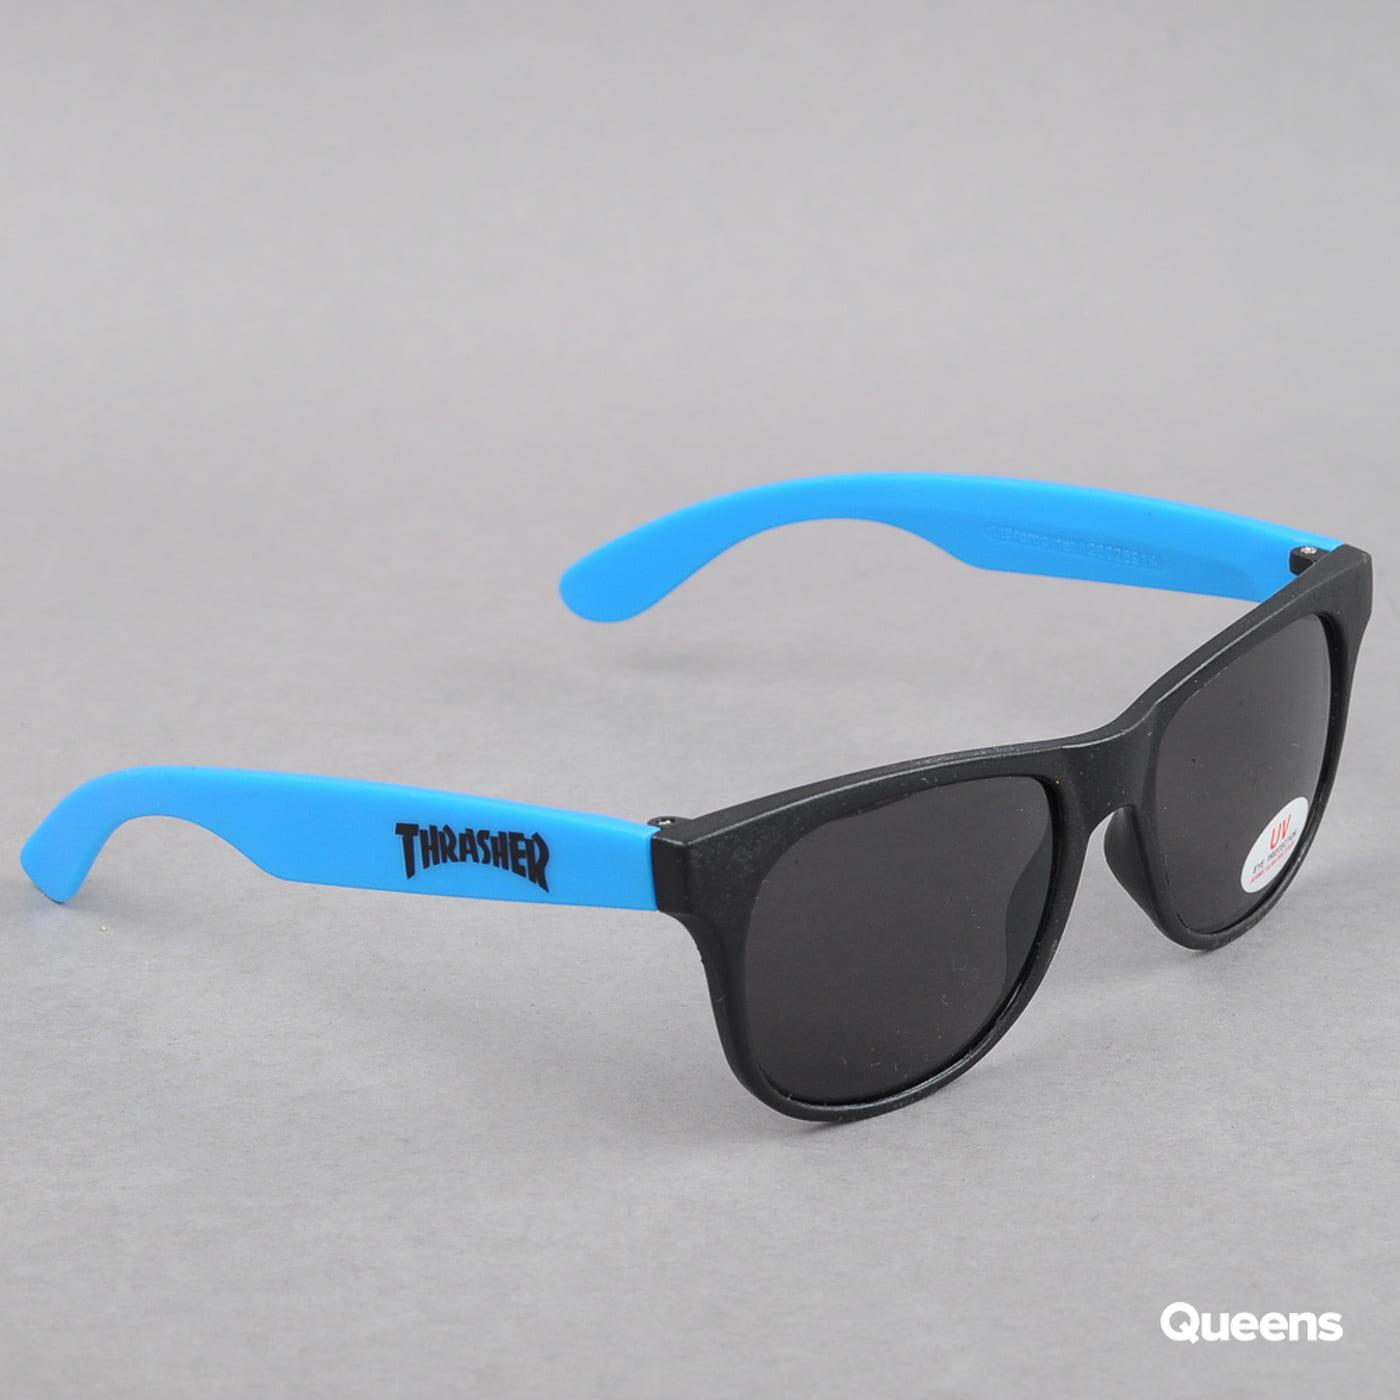 Thrasher Thrasher Sunglasses black / blue